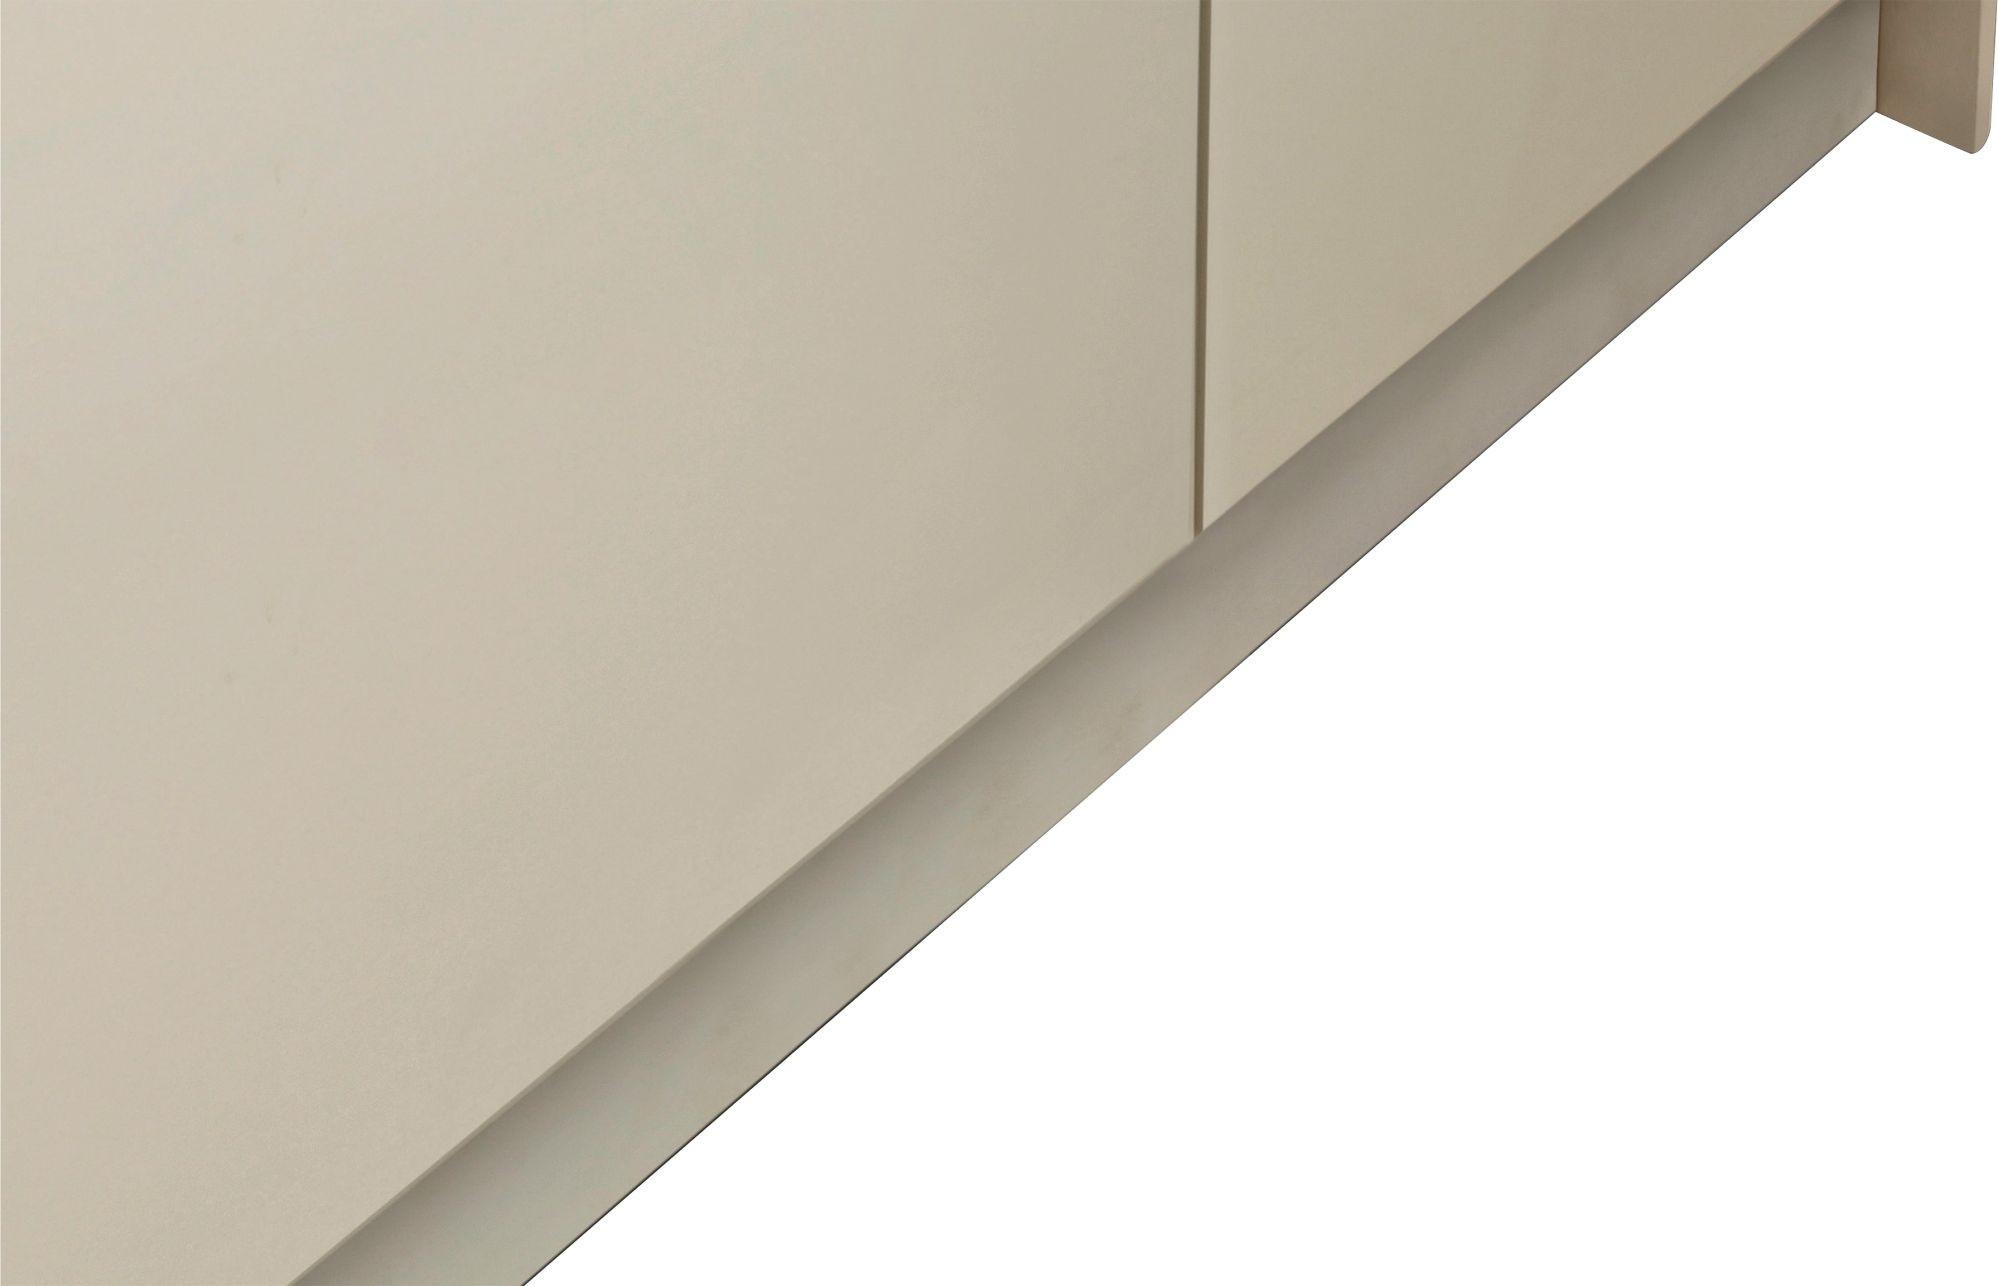 teamsix sn778x16te siemens elektro gro einbau geschirrsp ler vollintegrierbar. Black Bedroom Furniture Sets. Home Design Ideas